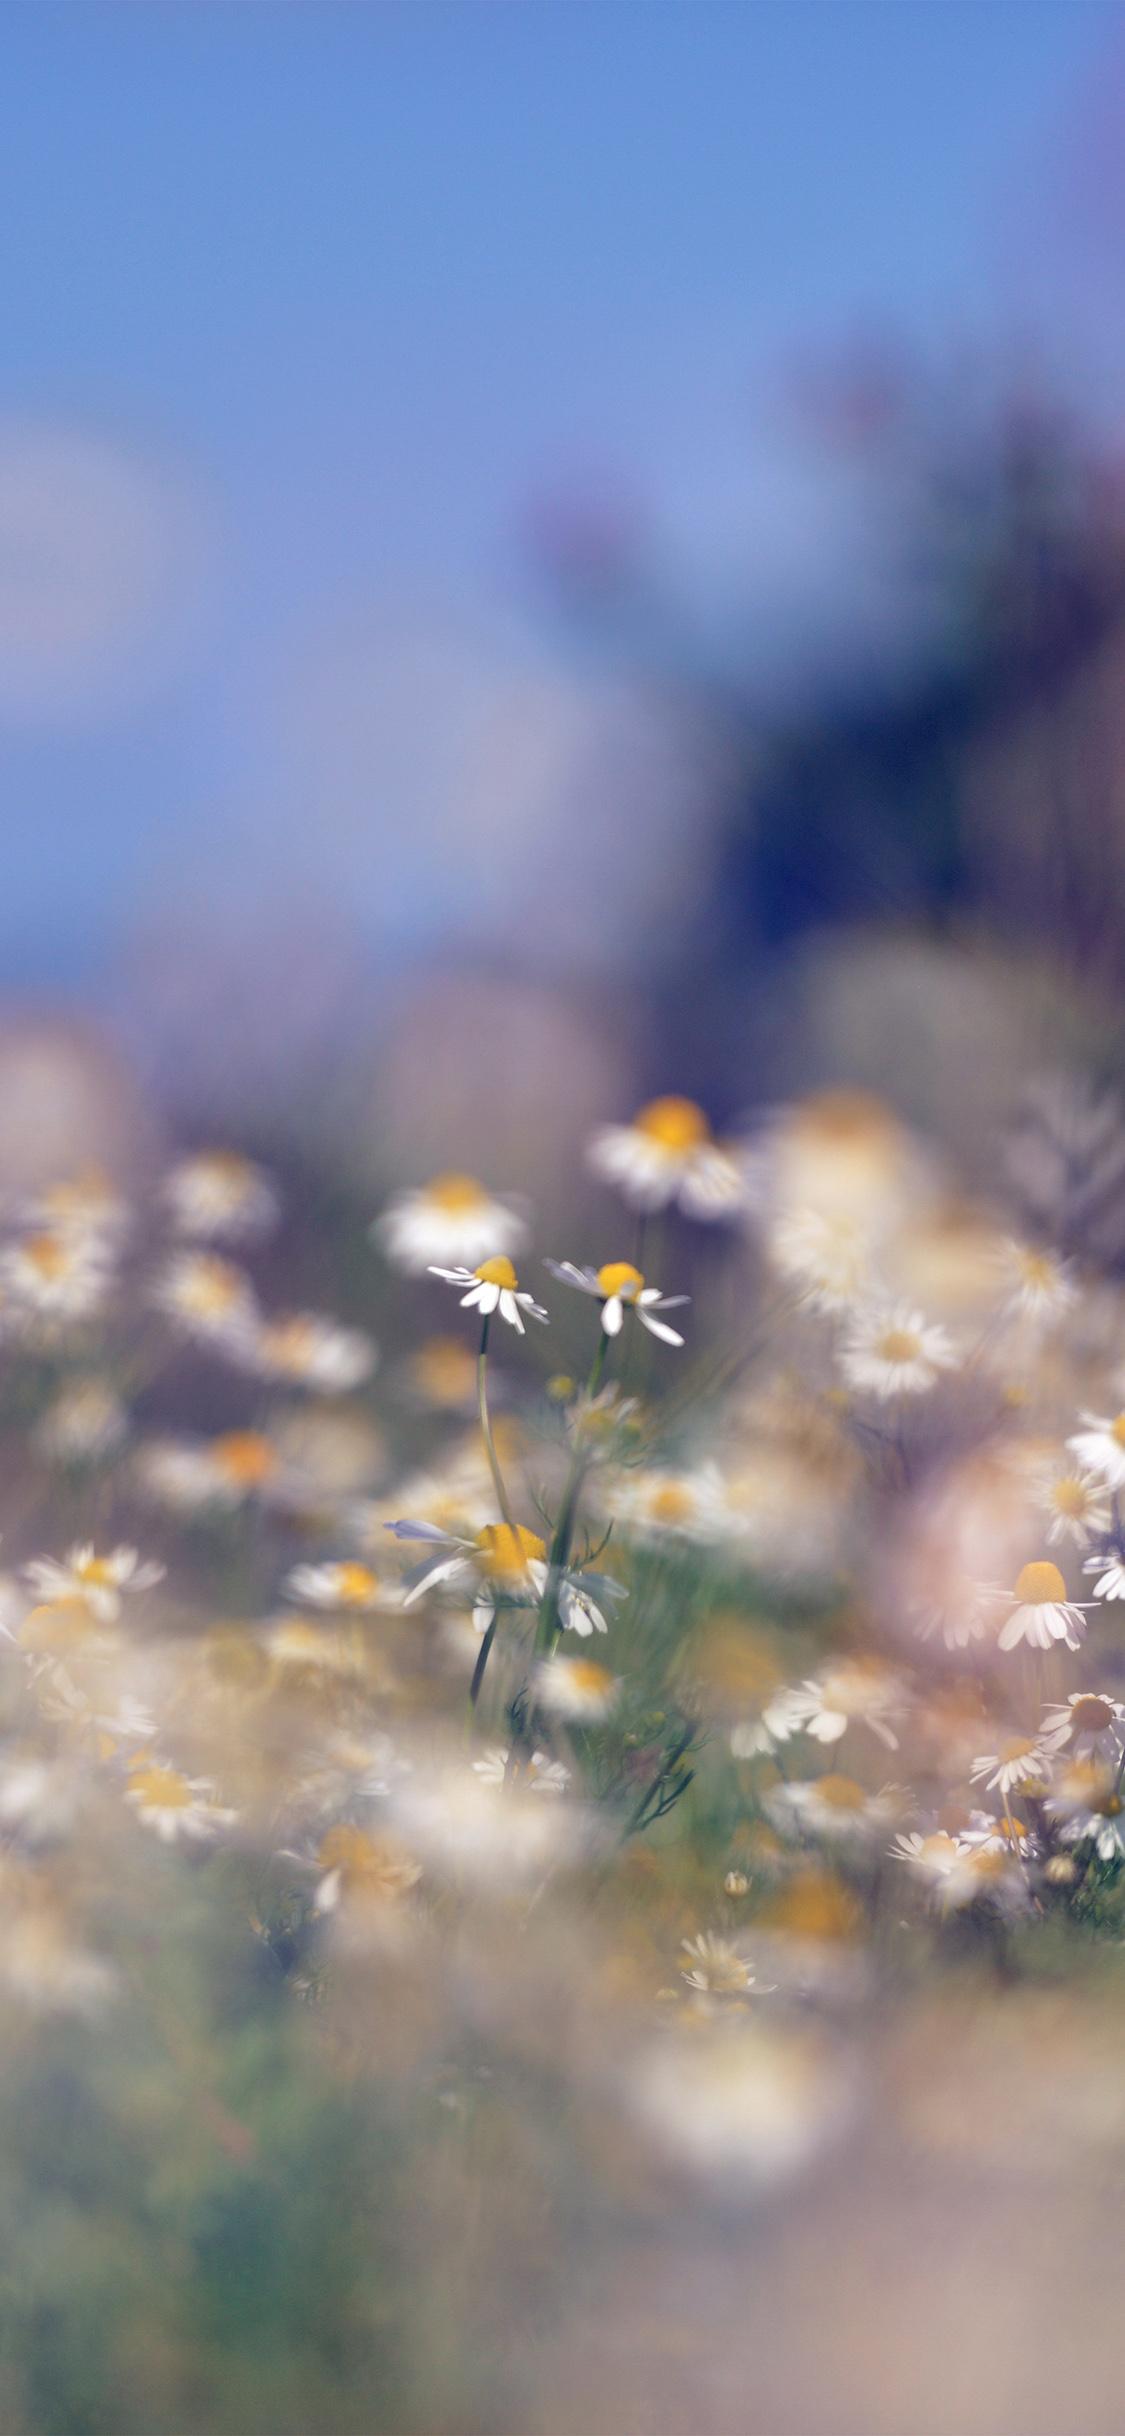 iPhoneXpapers.com-Apple-iPhone-wallpaper-mx65-flower-bokeh-white-spring-nature-blue